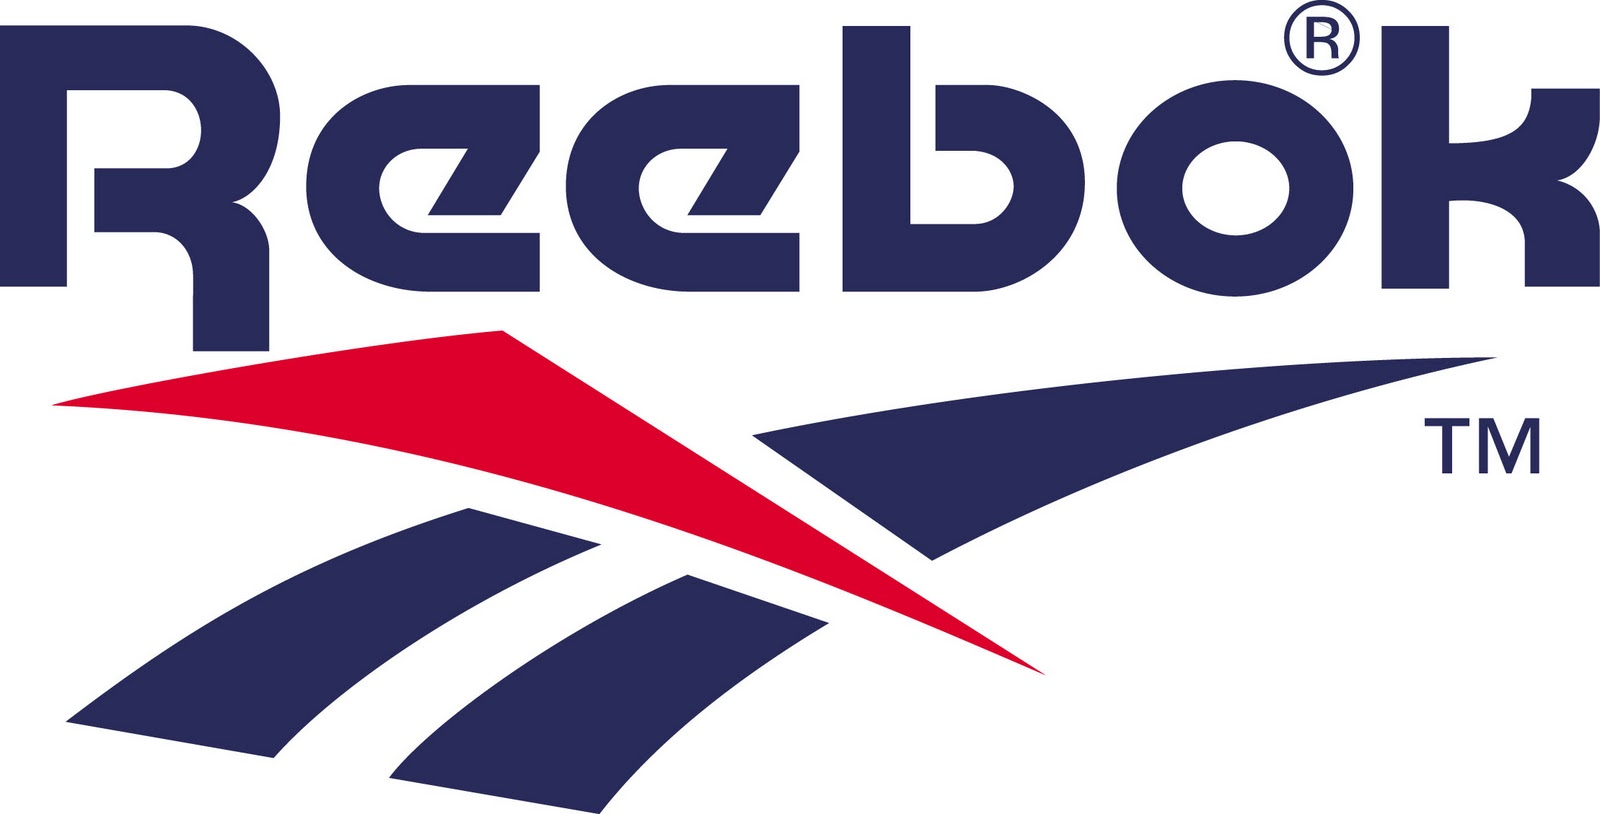 digital reebok logo images